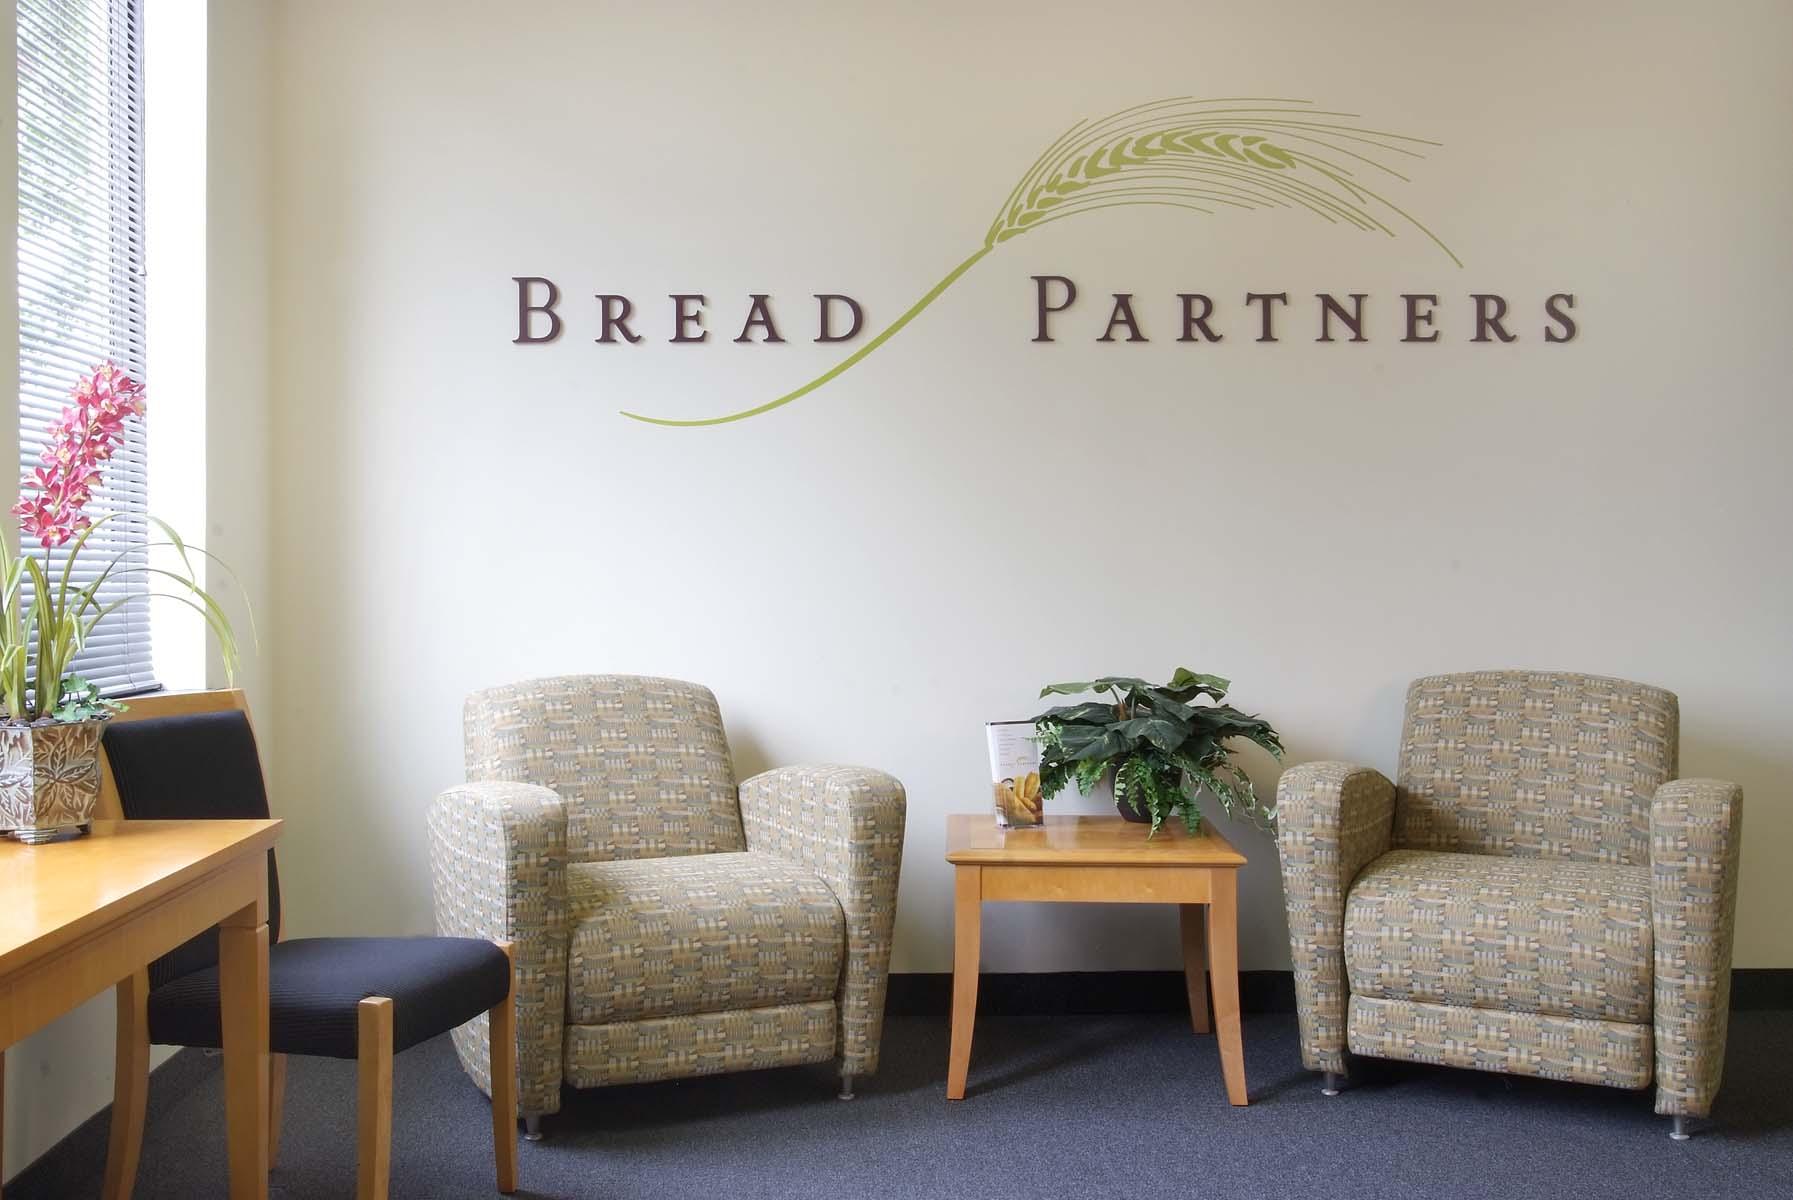 BreadPartners1.jpg